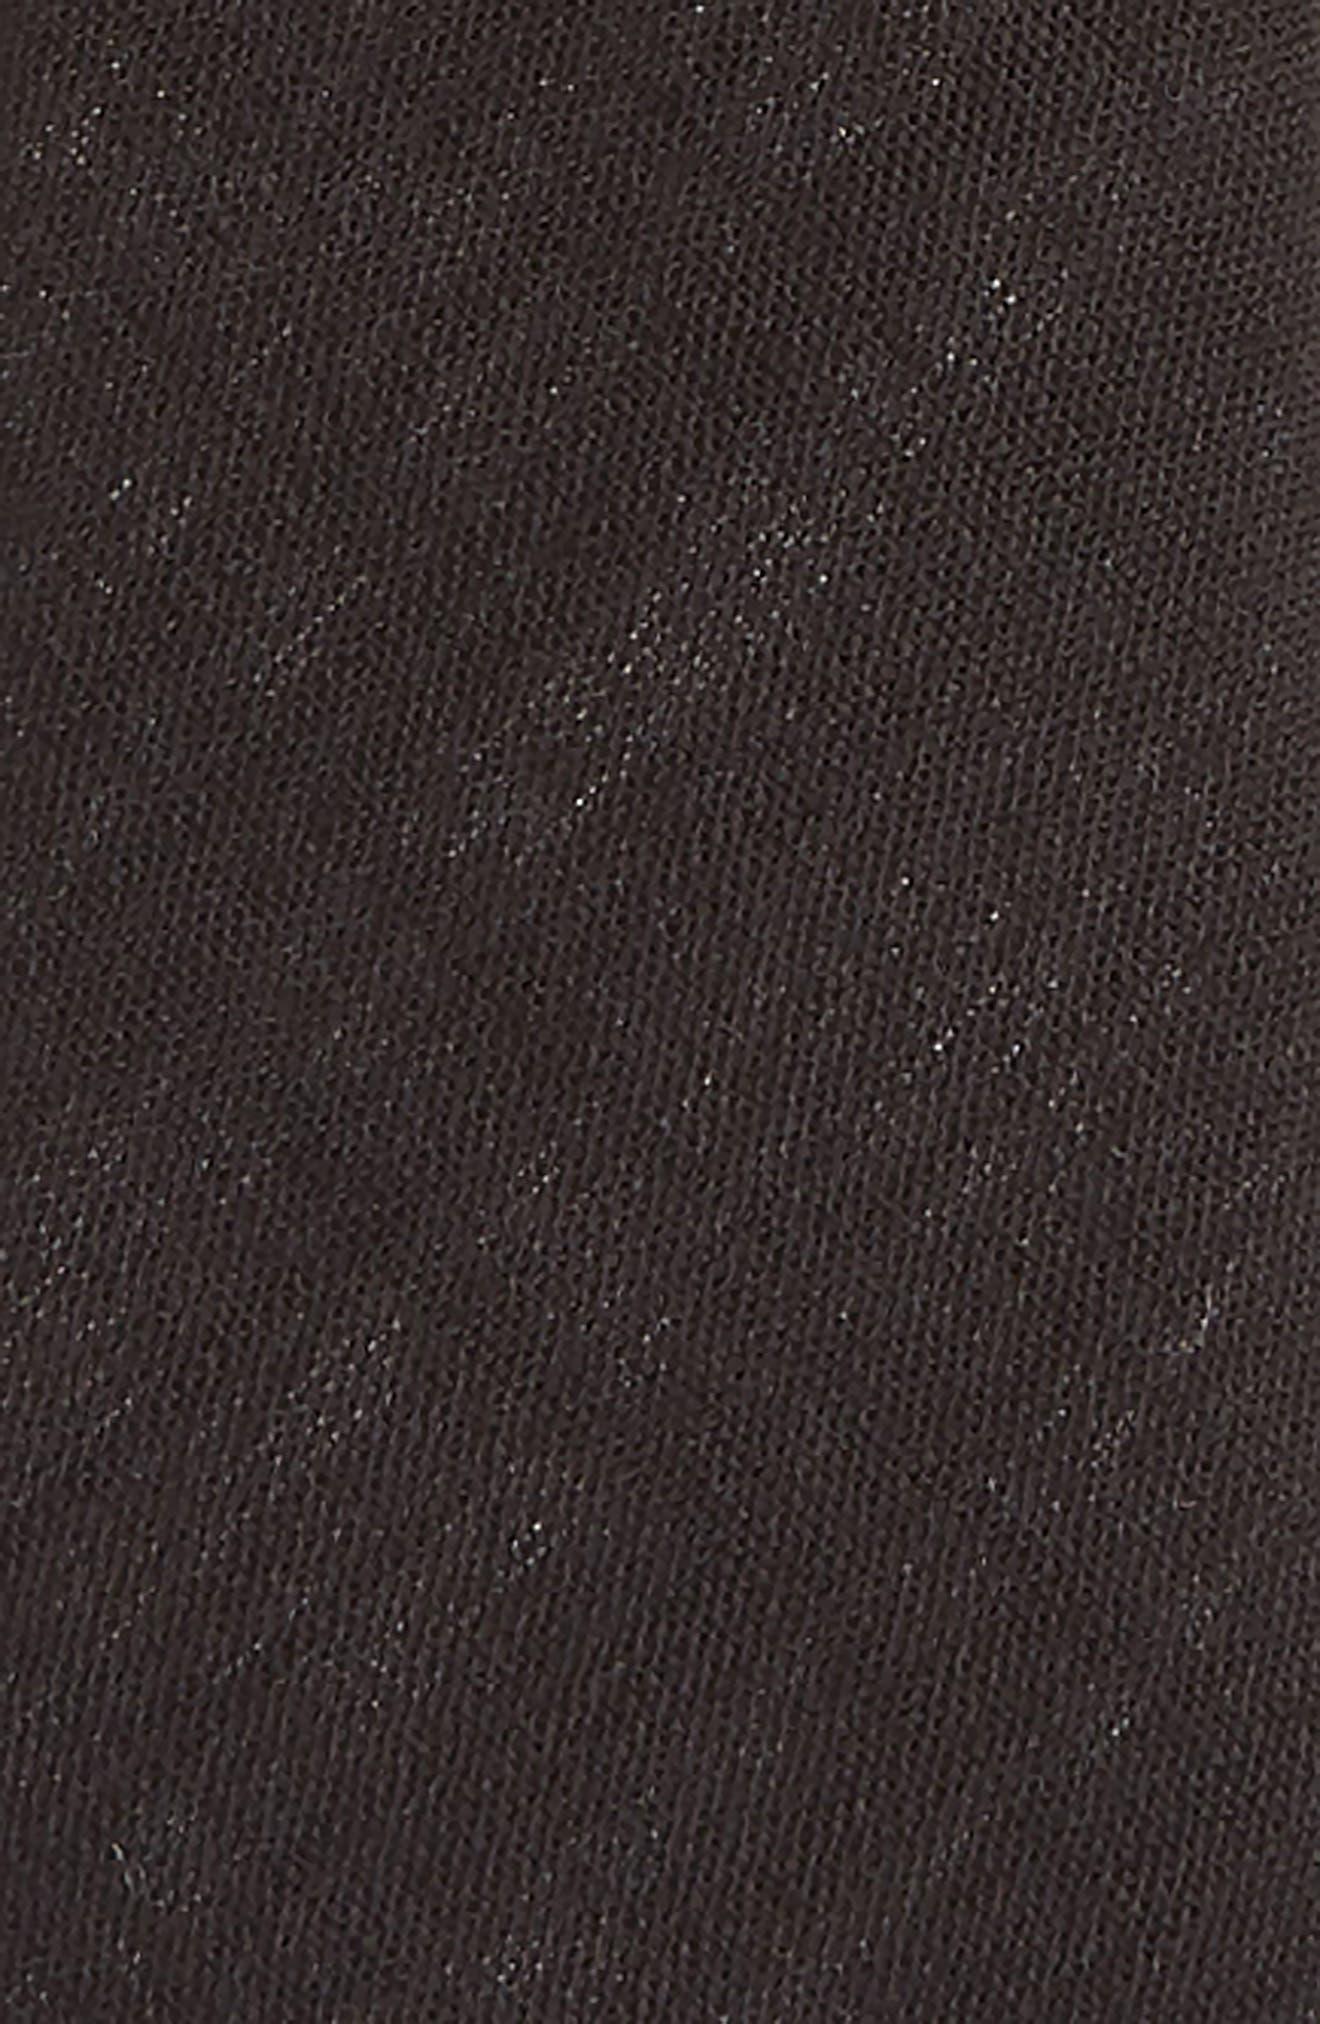 ,                             Solid Zip Tie,                             Alternate thumbnail 2, color,                             BLACK